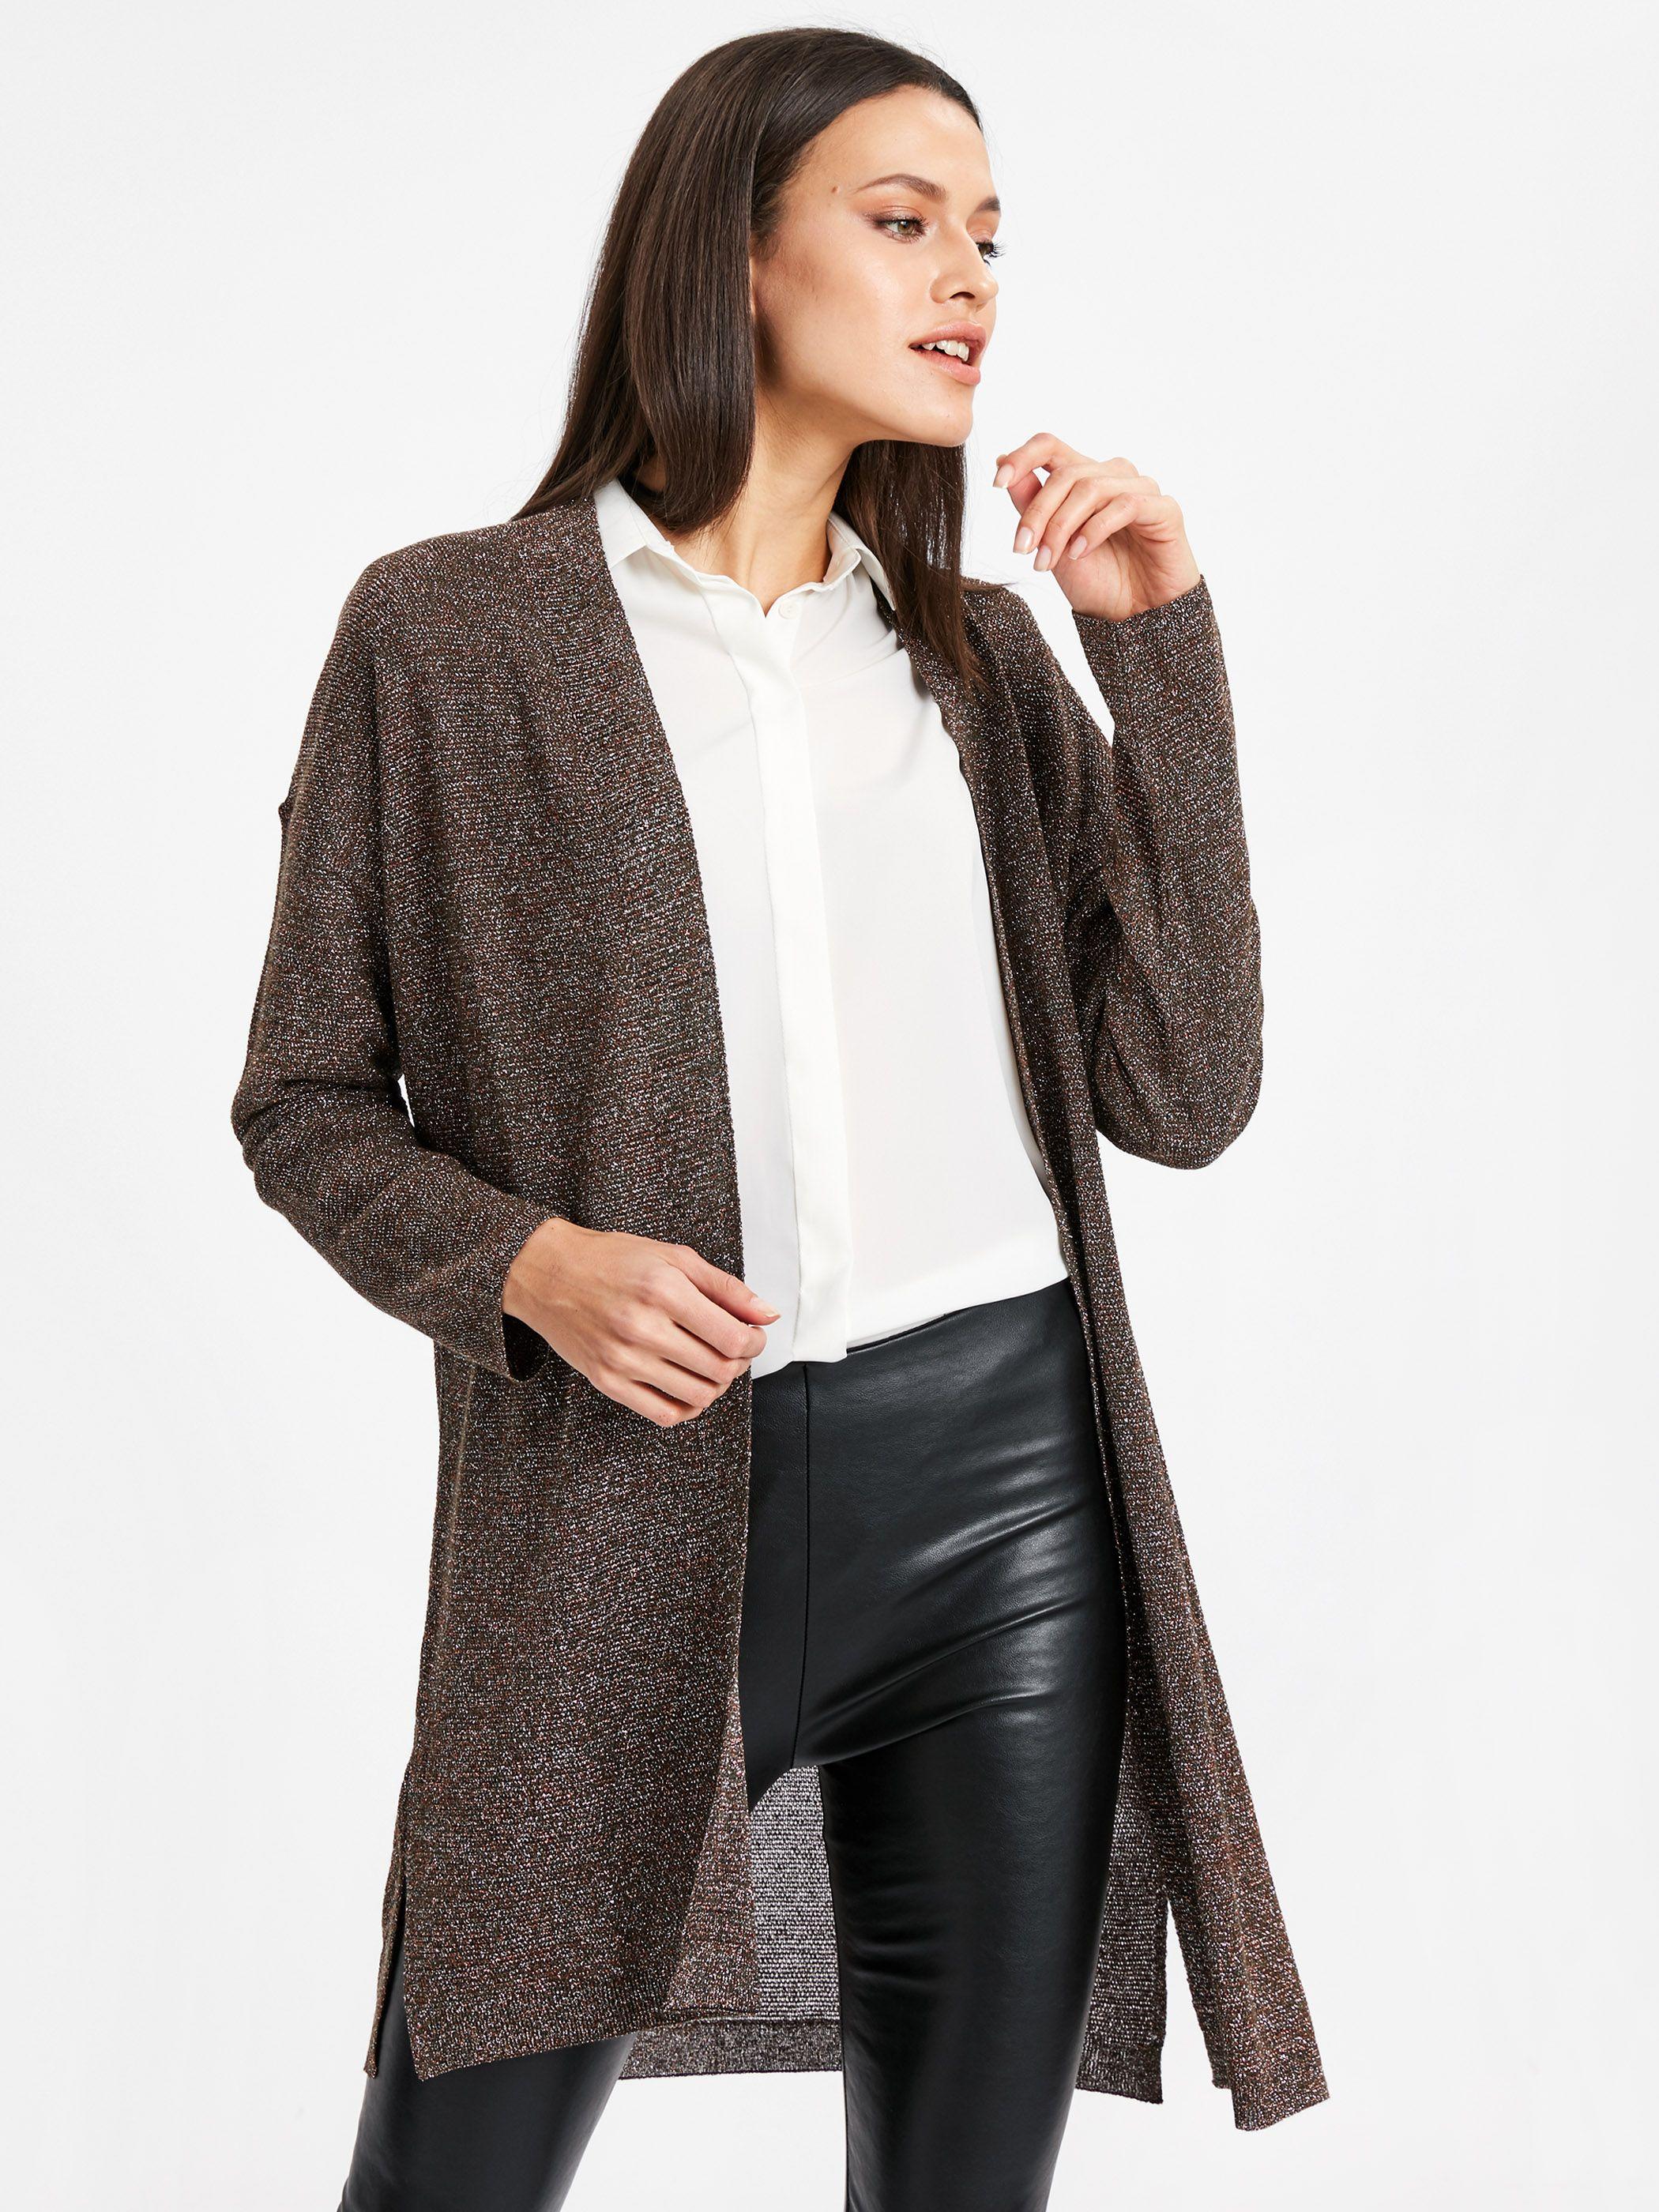 ژاکت خاکی ال سی وایکیکی Fashion Women Jackets